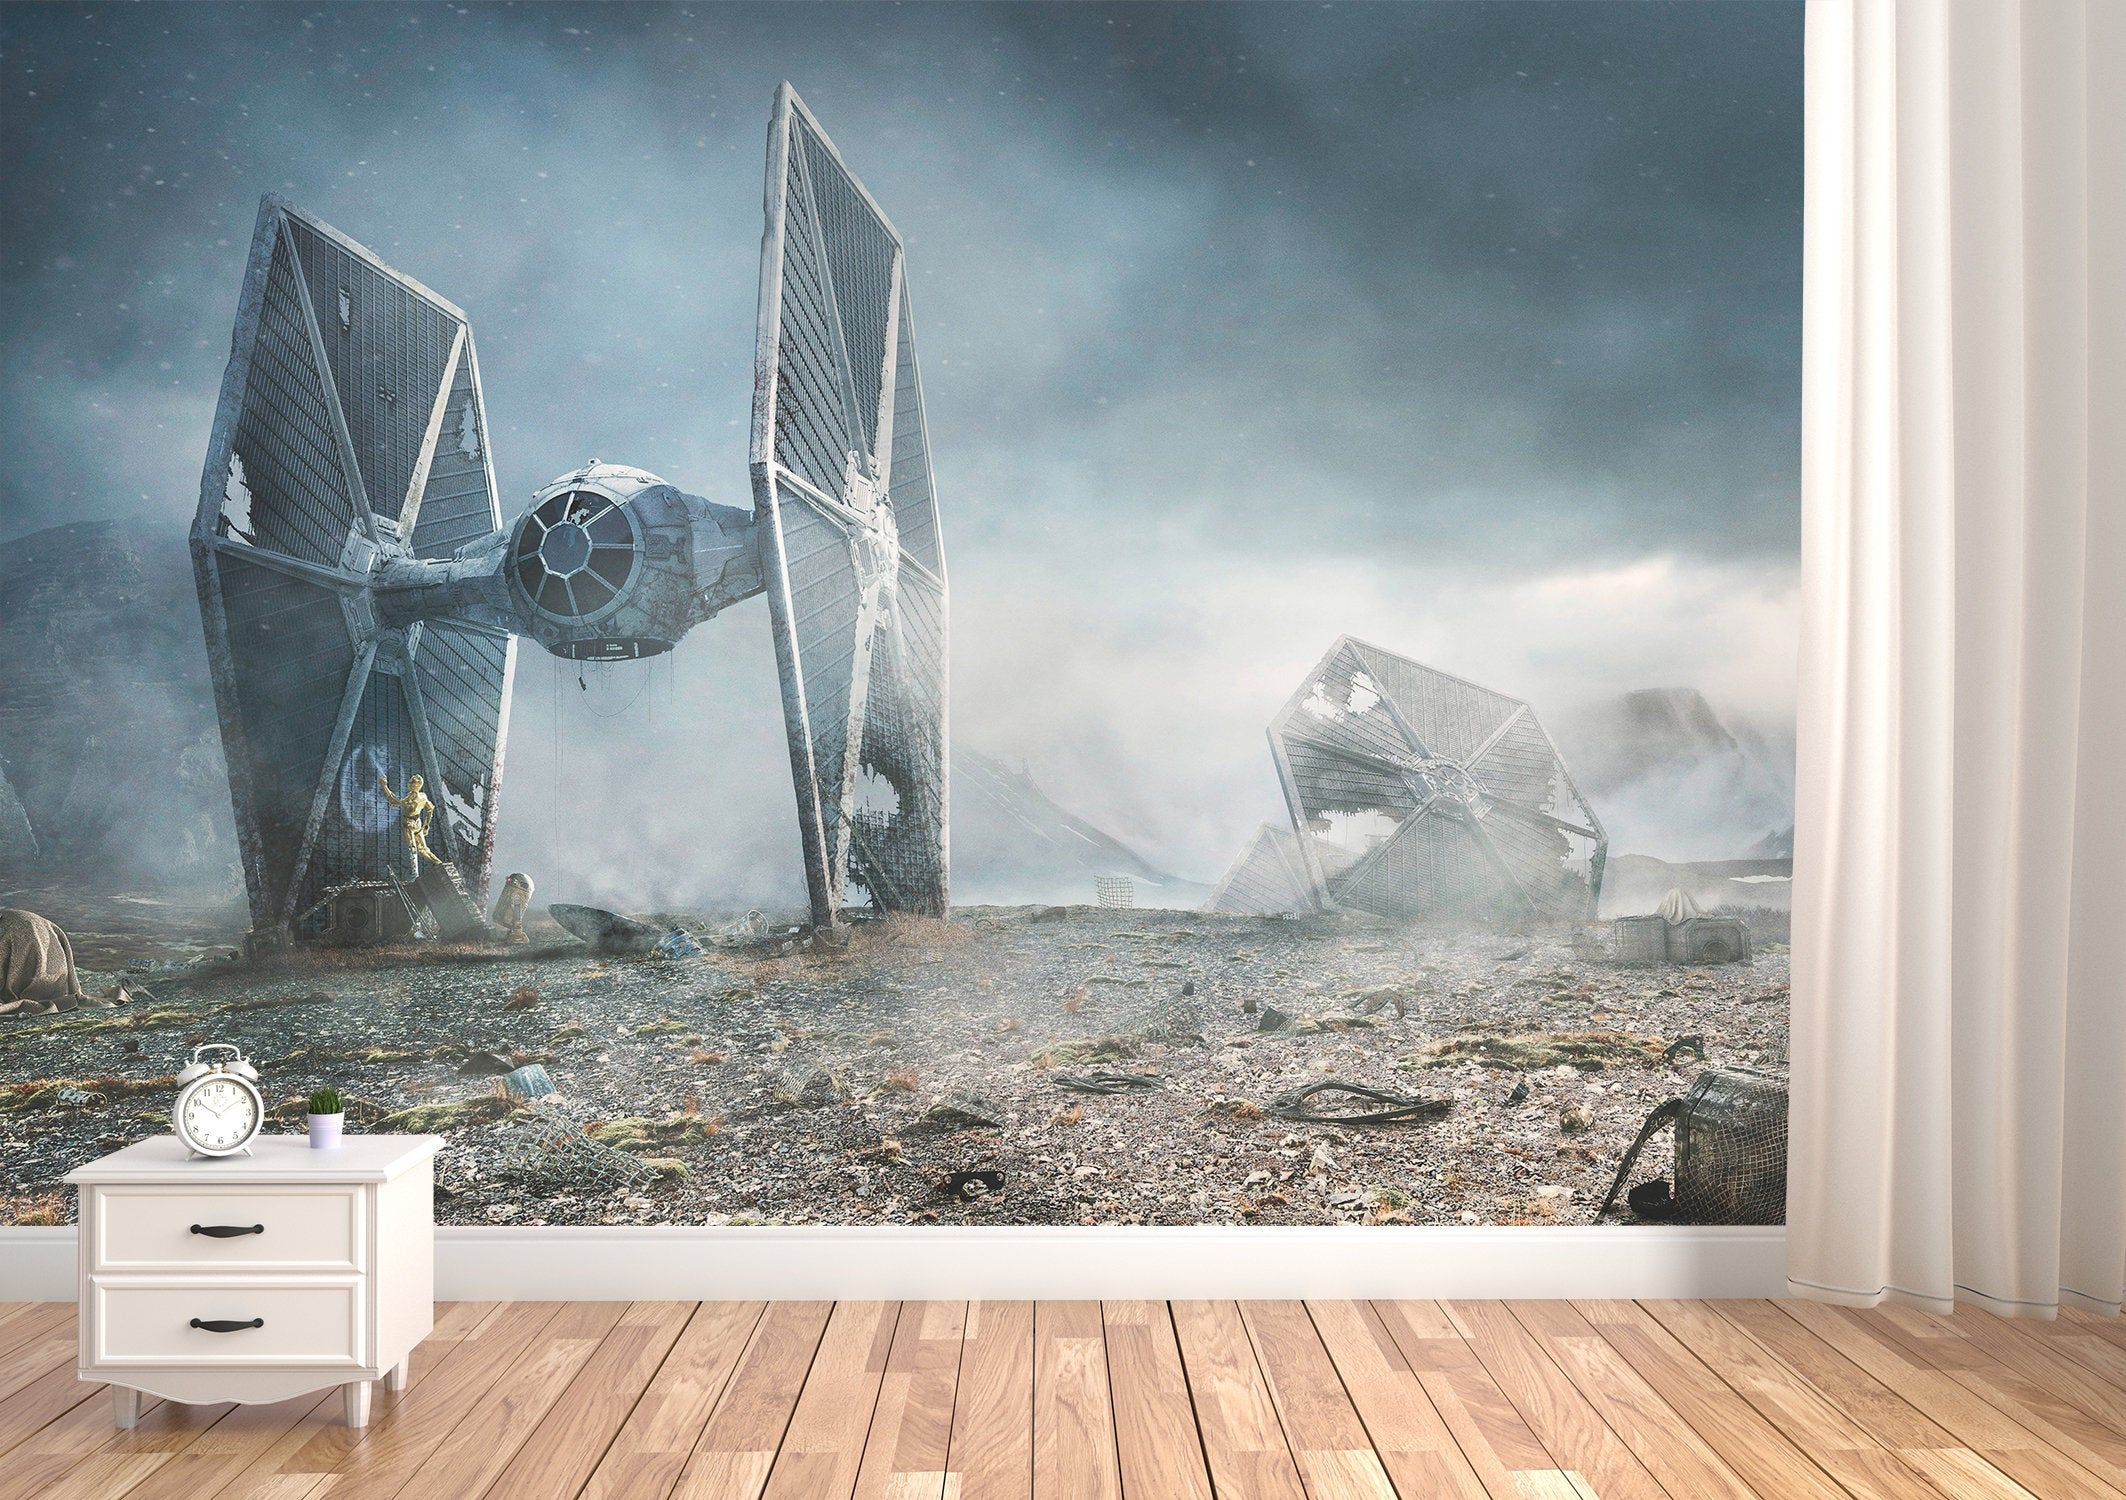 Star Wars Wallpapers Star Wars Mural Star Wars Prints Star Etsy In 2020 Star Wars Mural Star Wars Wallpaper Star Wars Prints